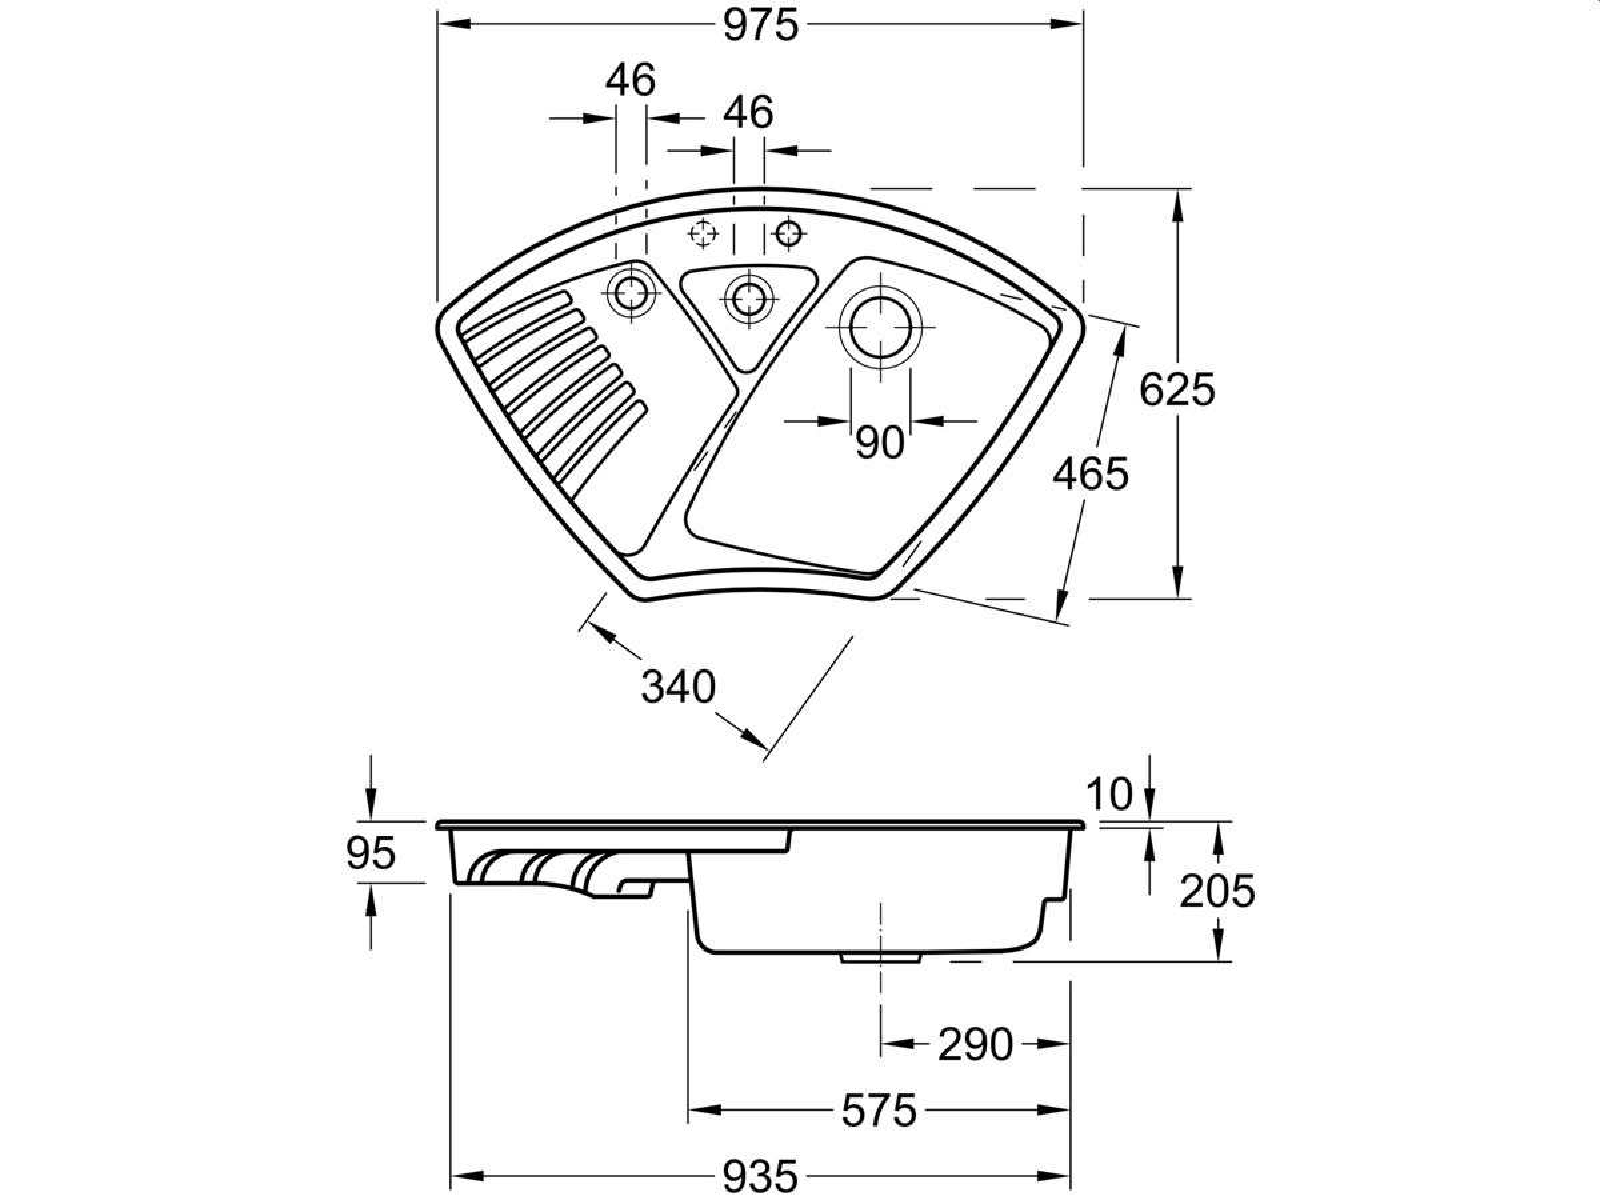 Villeroy & Boch Arena Eck Ebony - 6729 02 S5 Keramikspüle Exzenterbetätigung